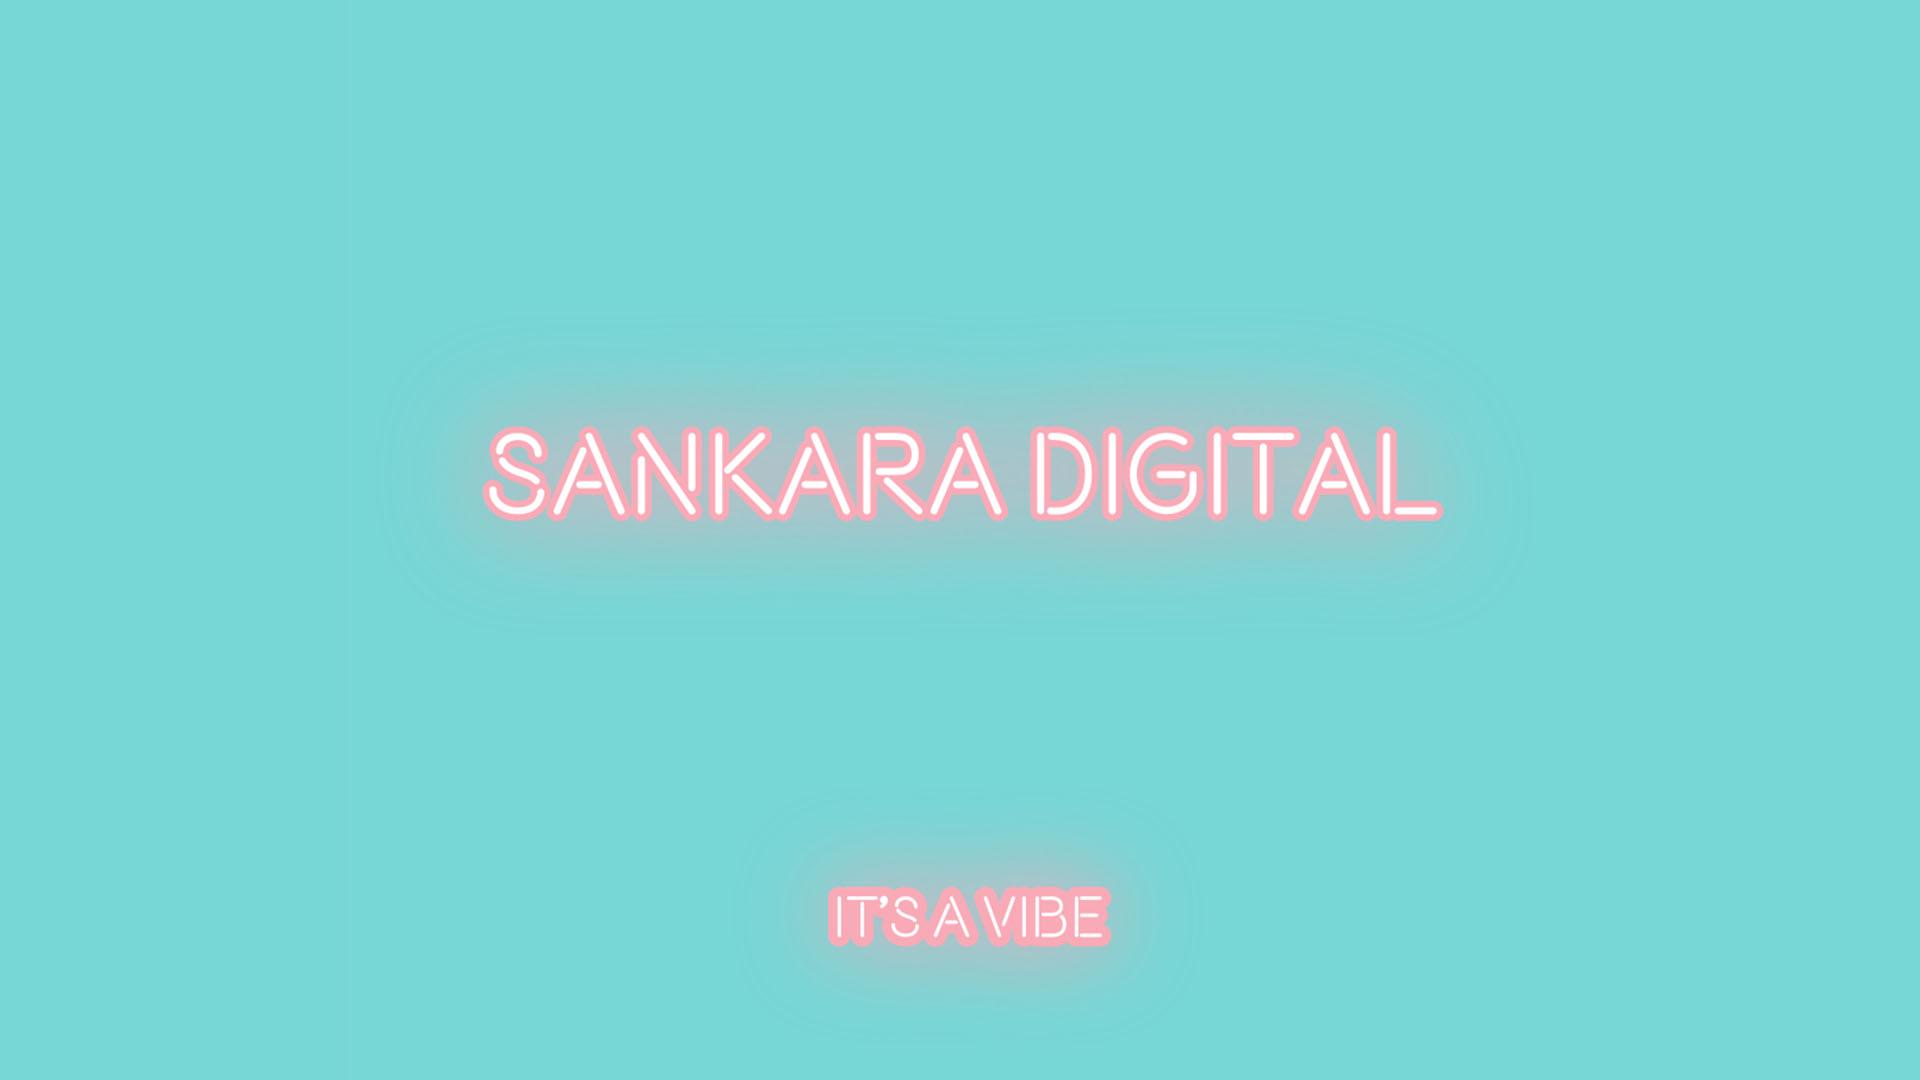 sankara digital